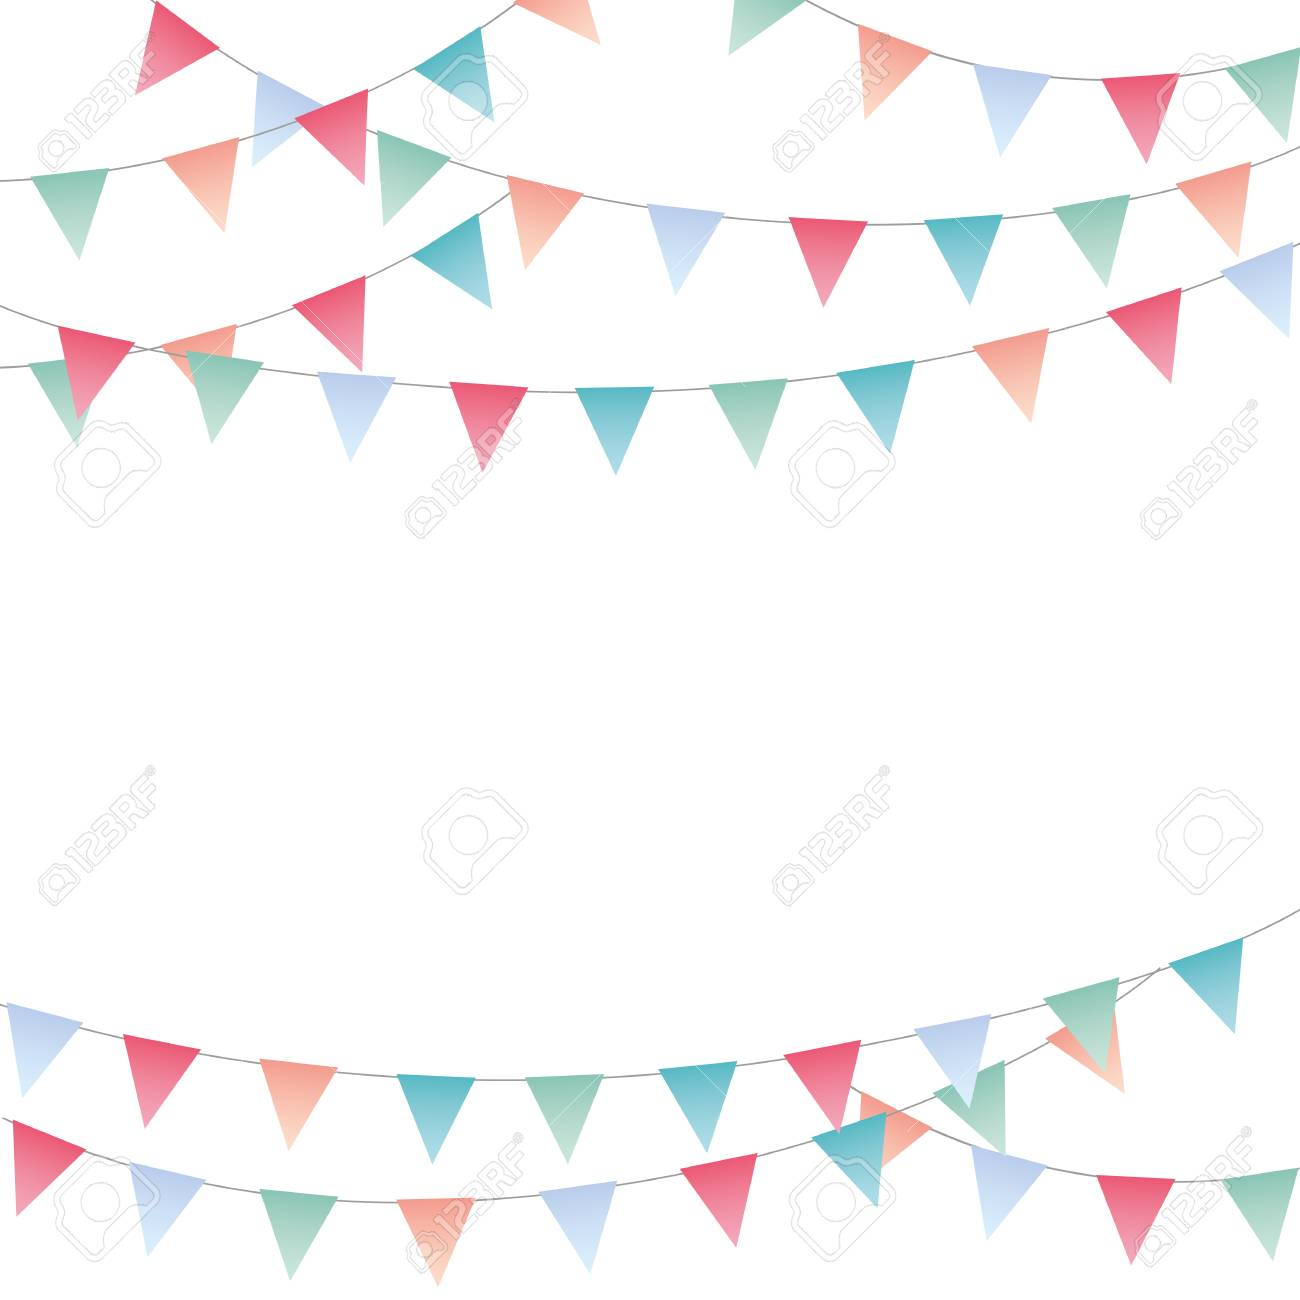 Sweet festive party pennants banner - 122497790